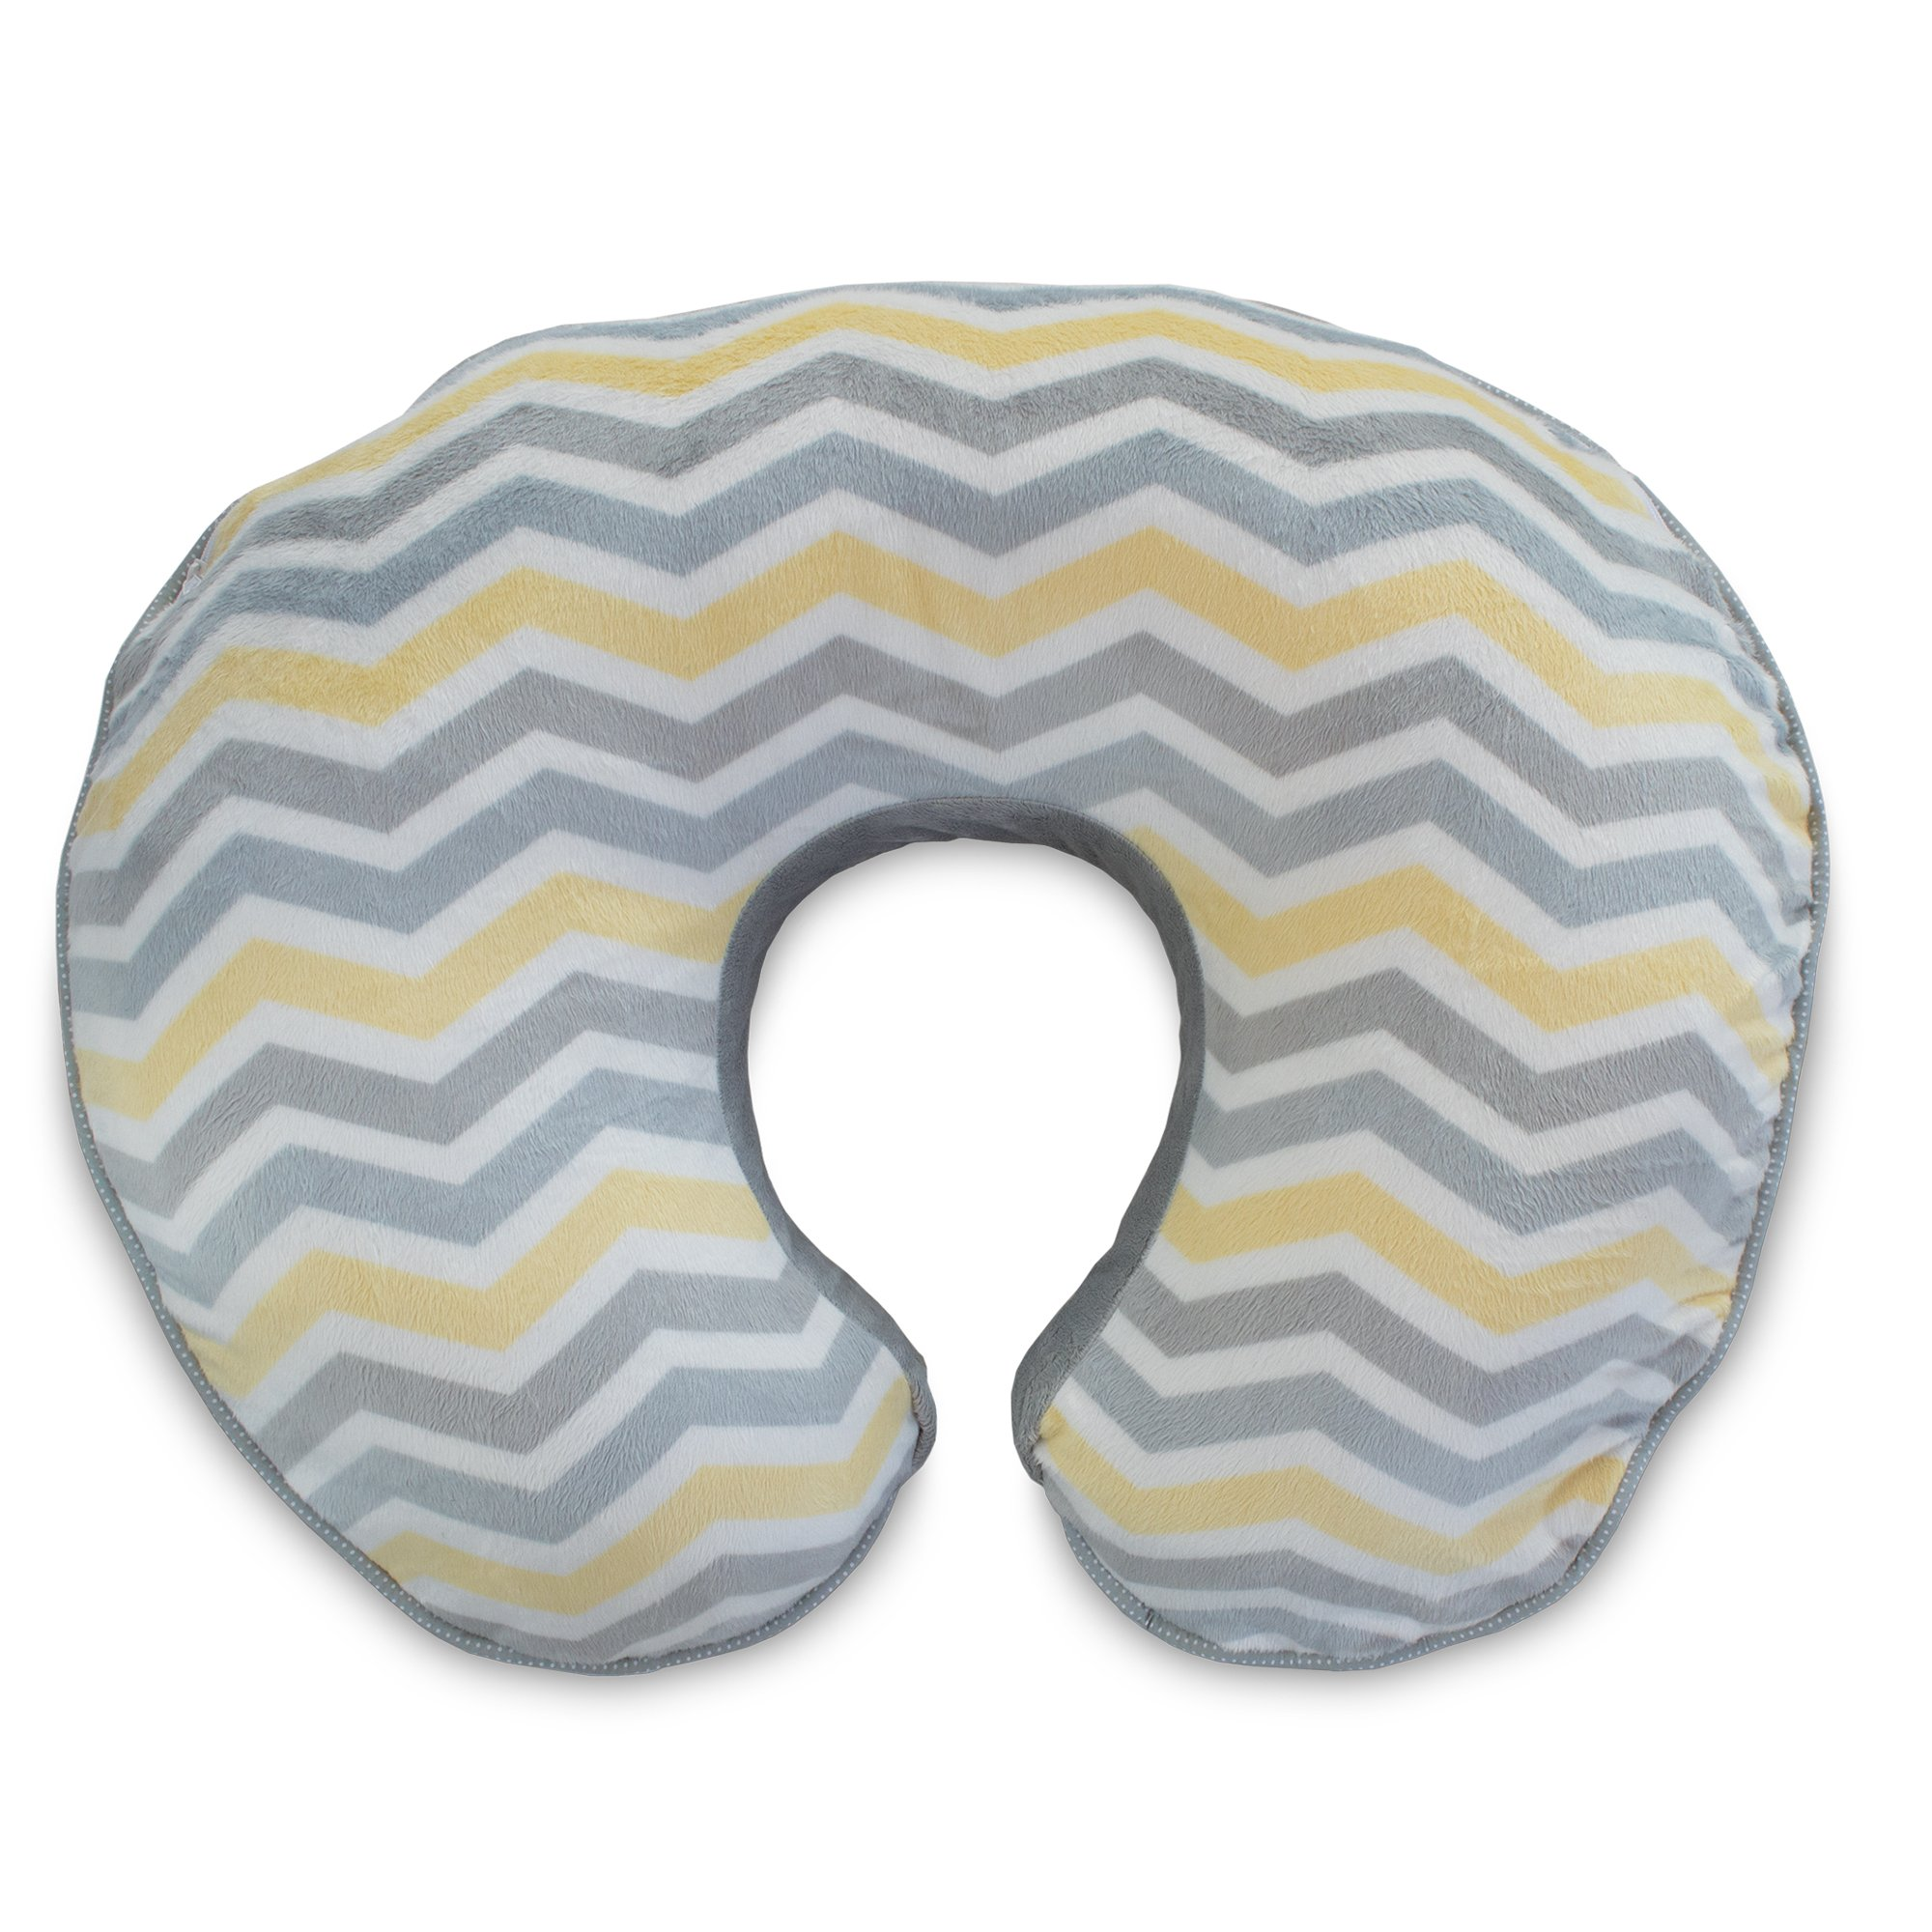 Boppy Pillow Slipcover, Boutique Gray Chevron